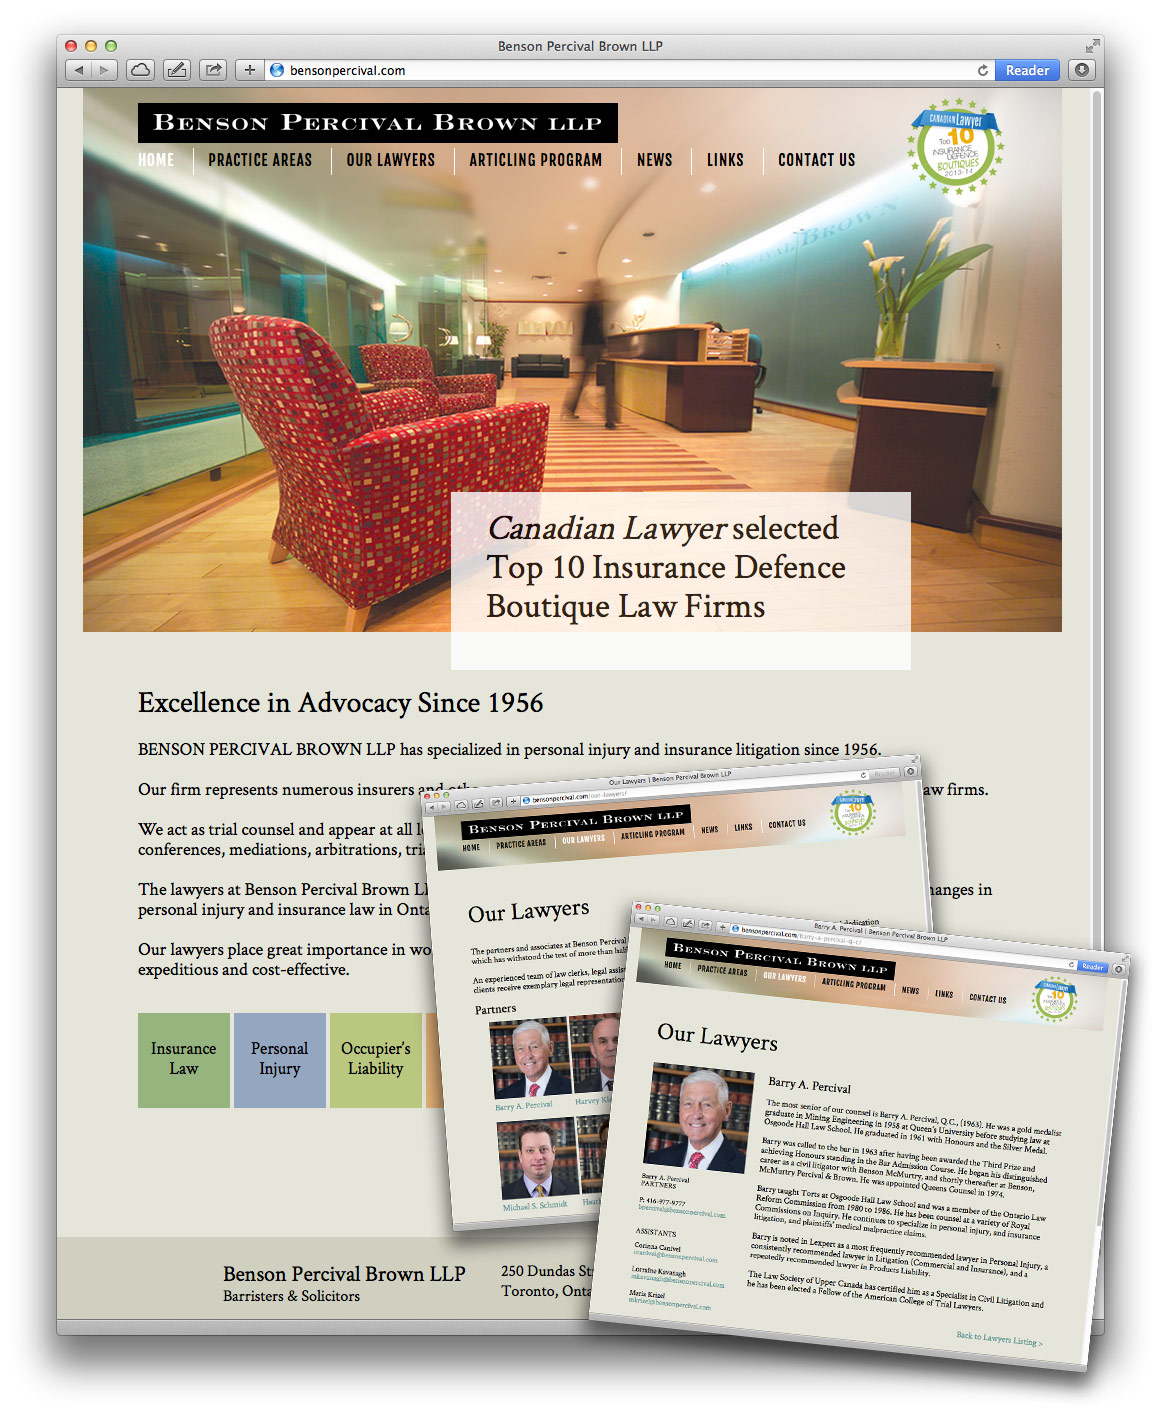 Law firm website design by Swerve Design Group